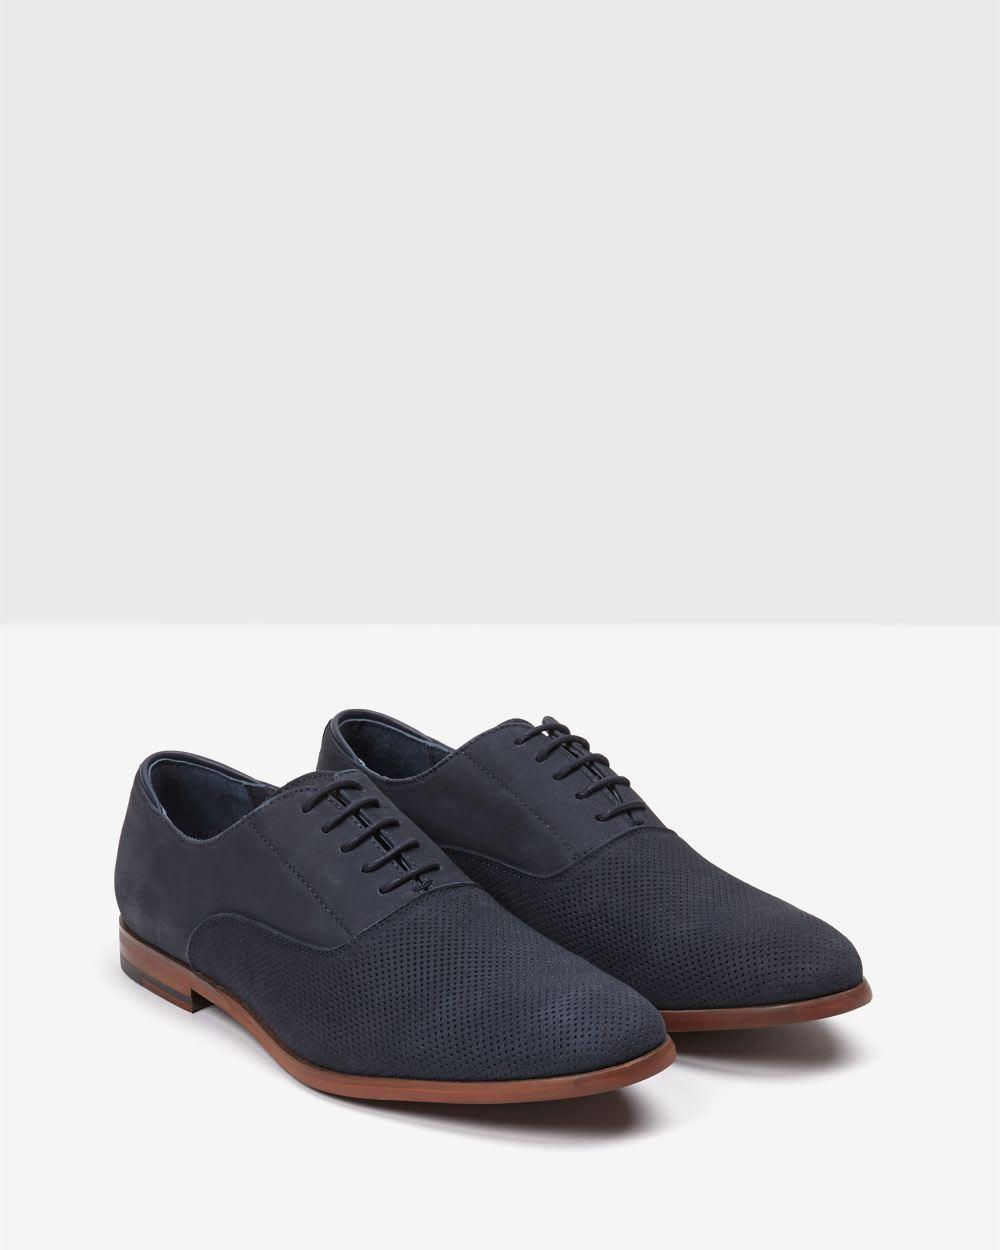 navy nubuck leather shoe rw co